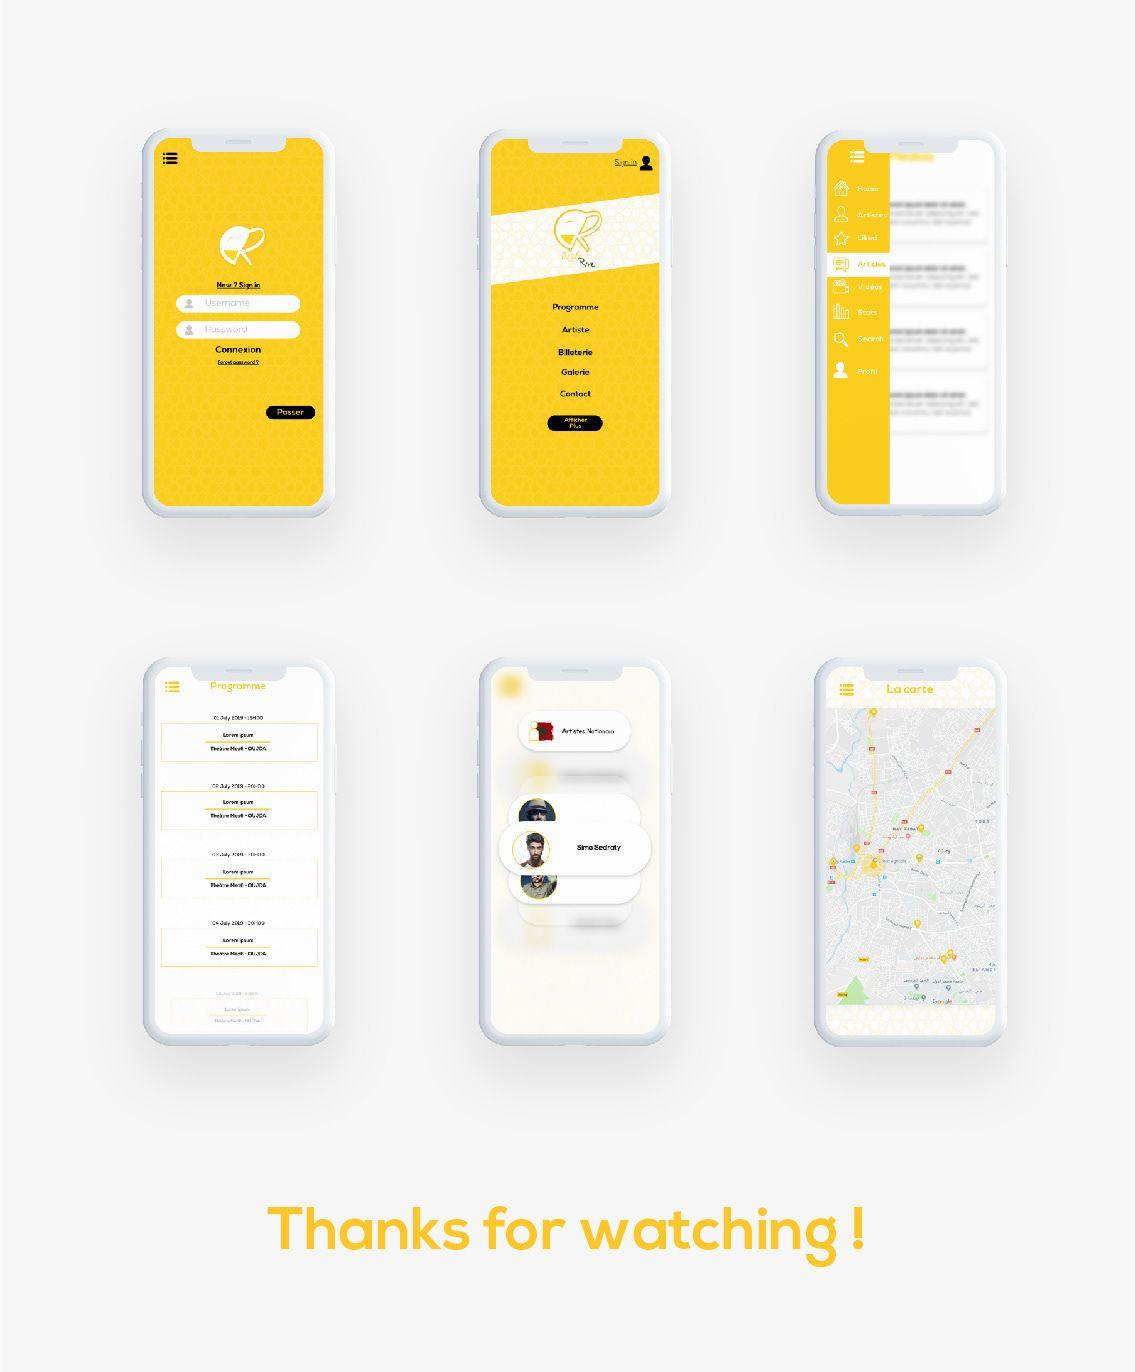 Humour Festival App On Behance Mobile App Design Inspiration Android App Design Mobile Web Design